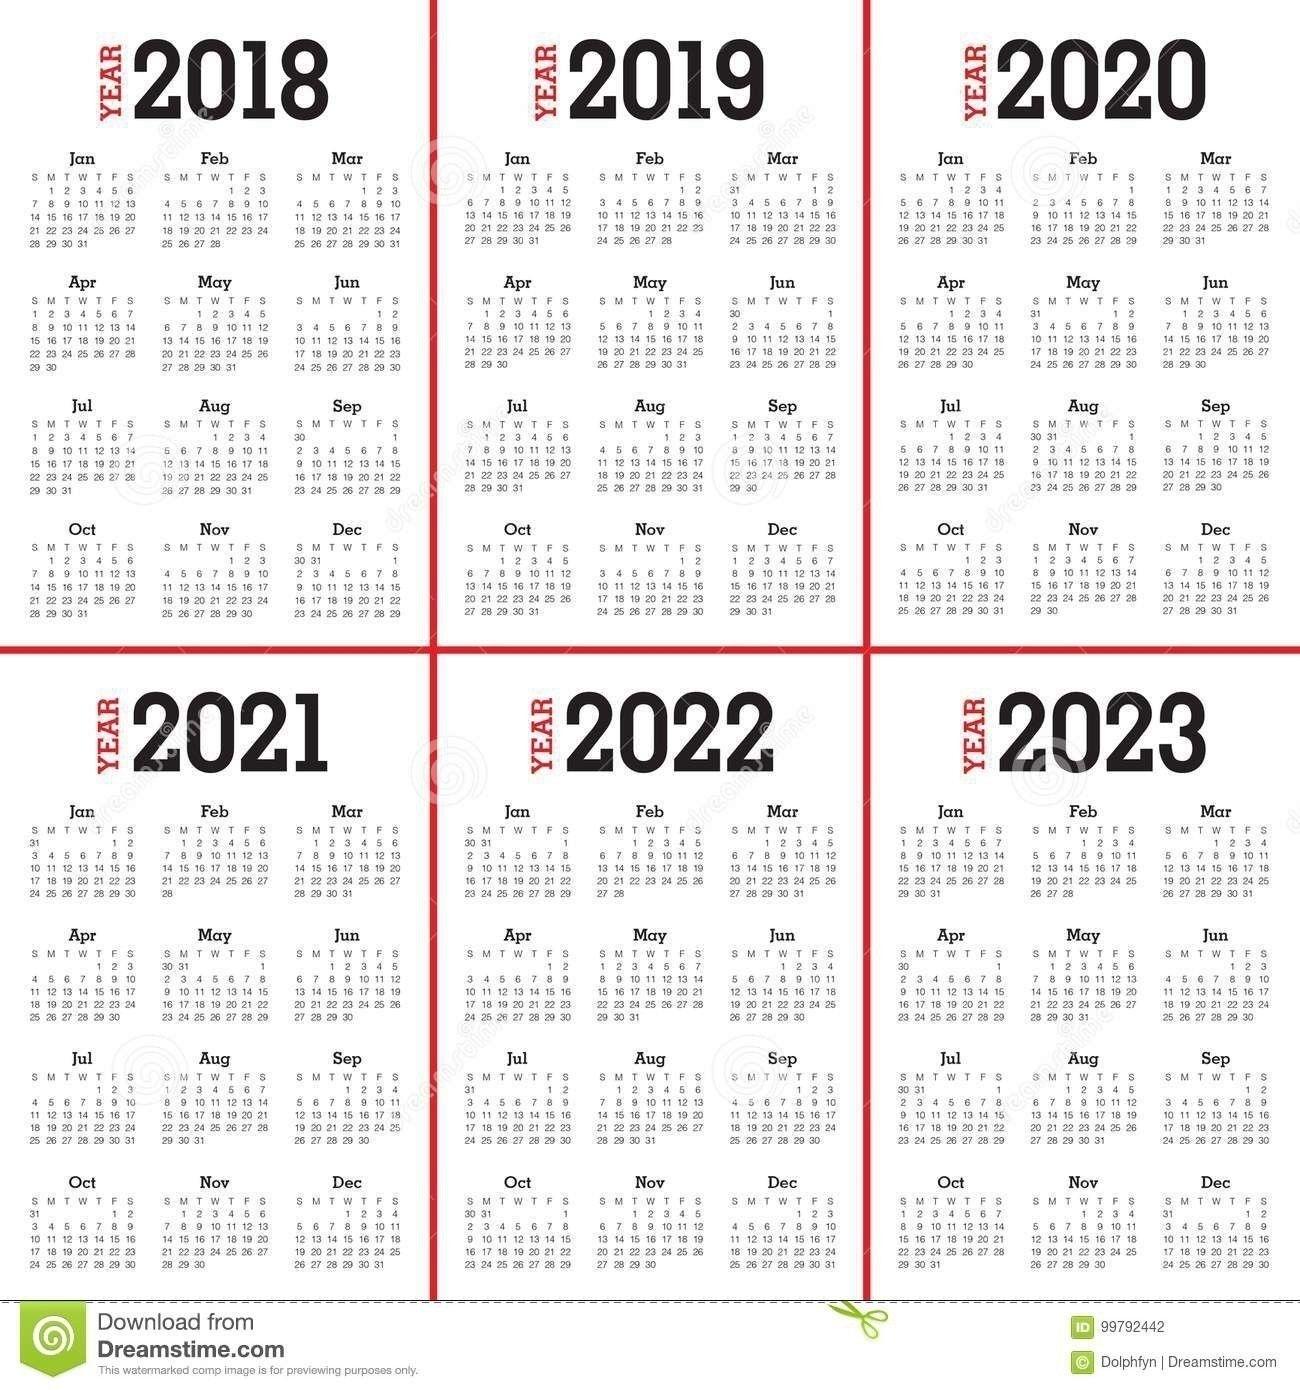 3 Year Calendar 2021 To 2023 In 2020 | Calendar Printables for 2019 2020 2021 2022 2023 Year Calendar Printable